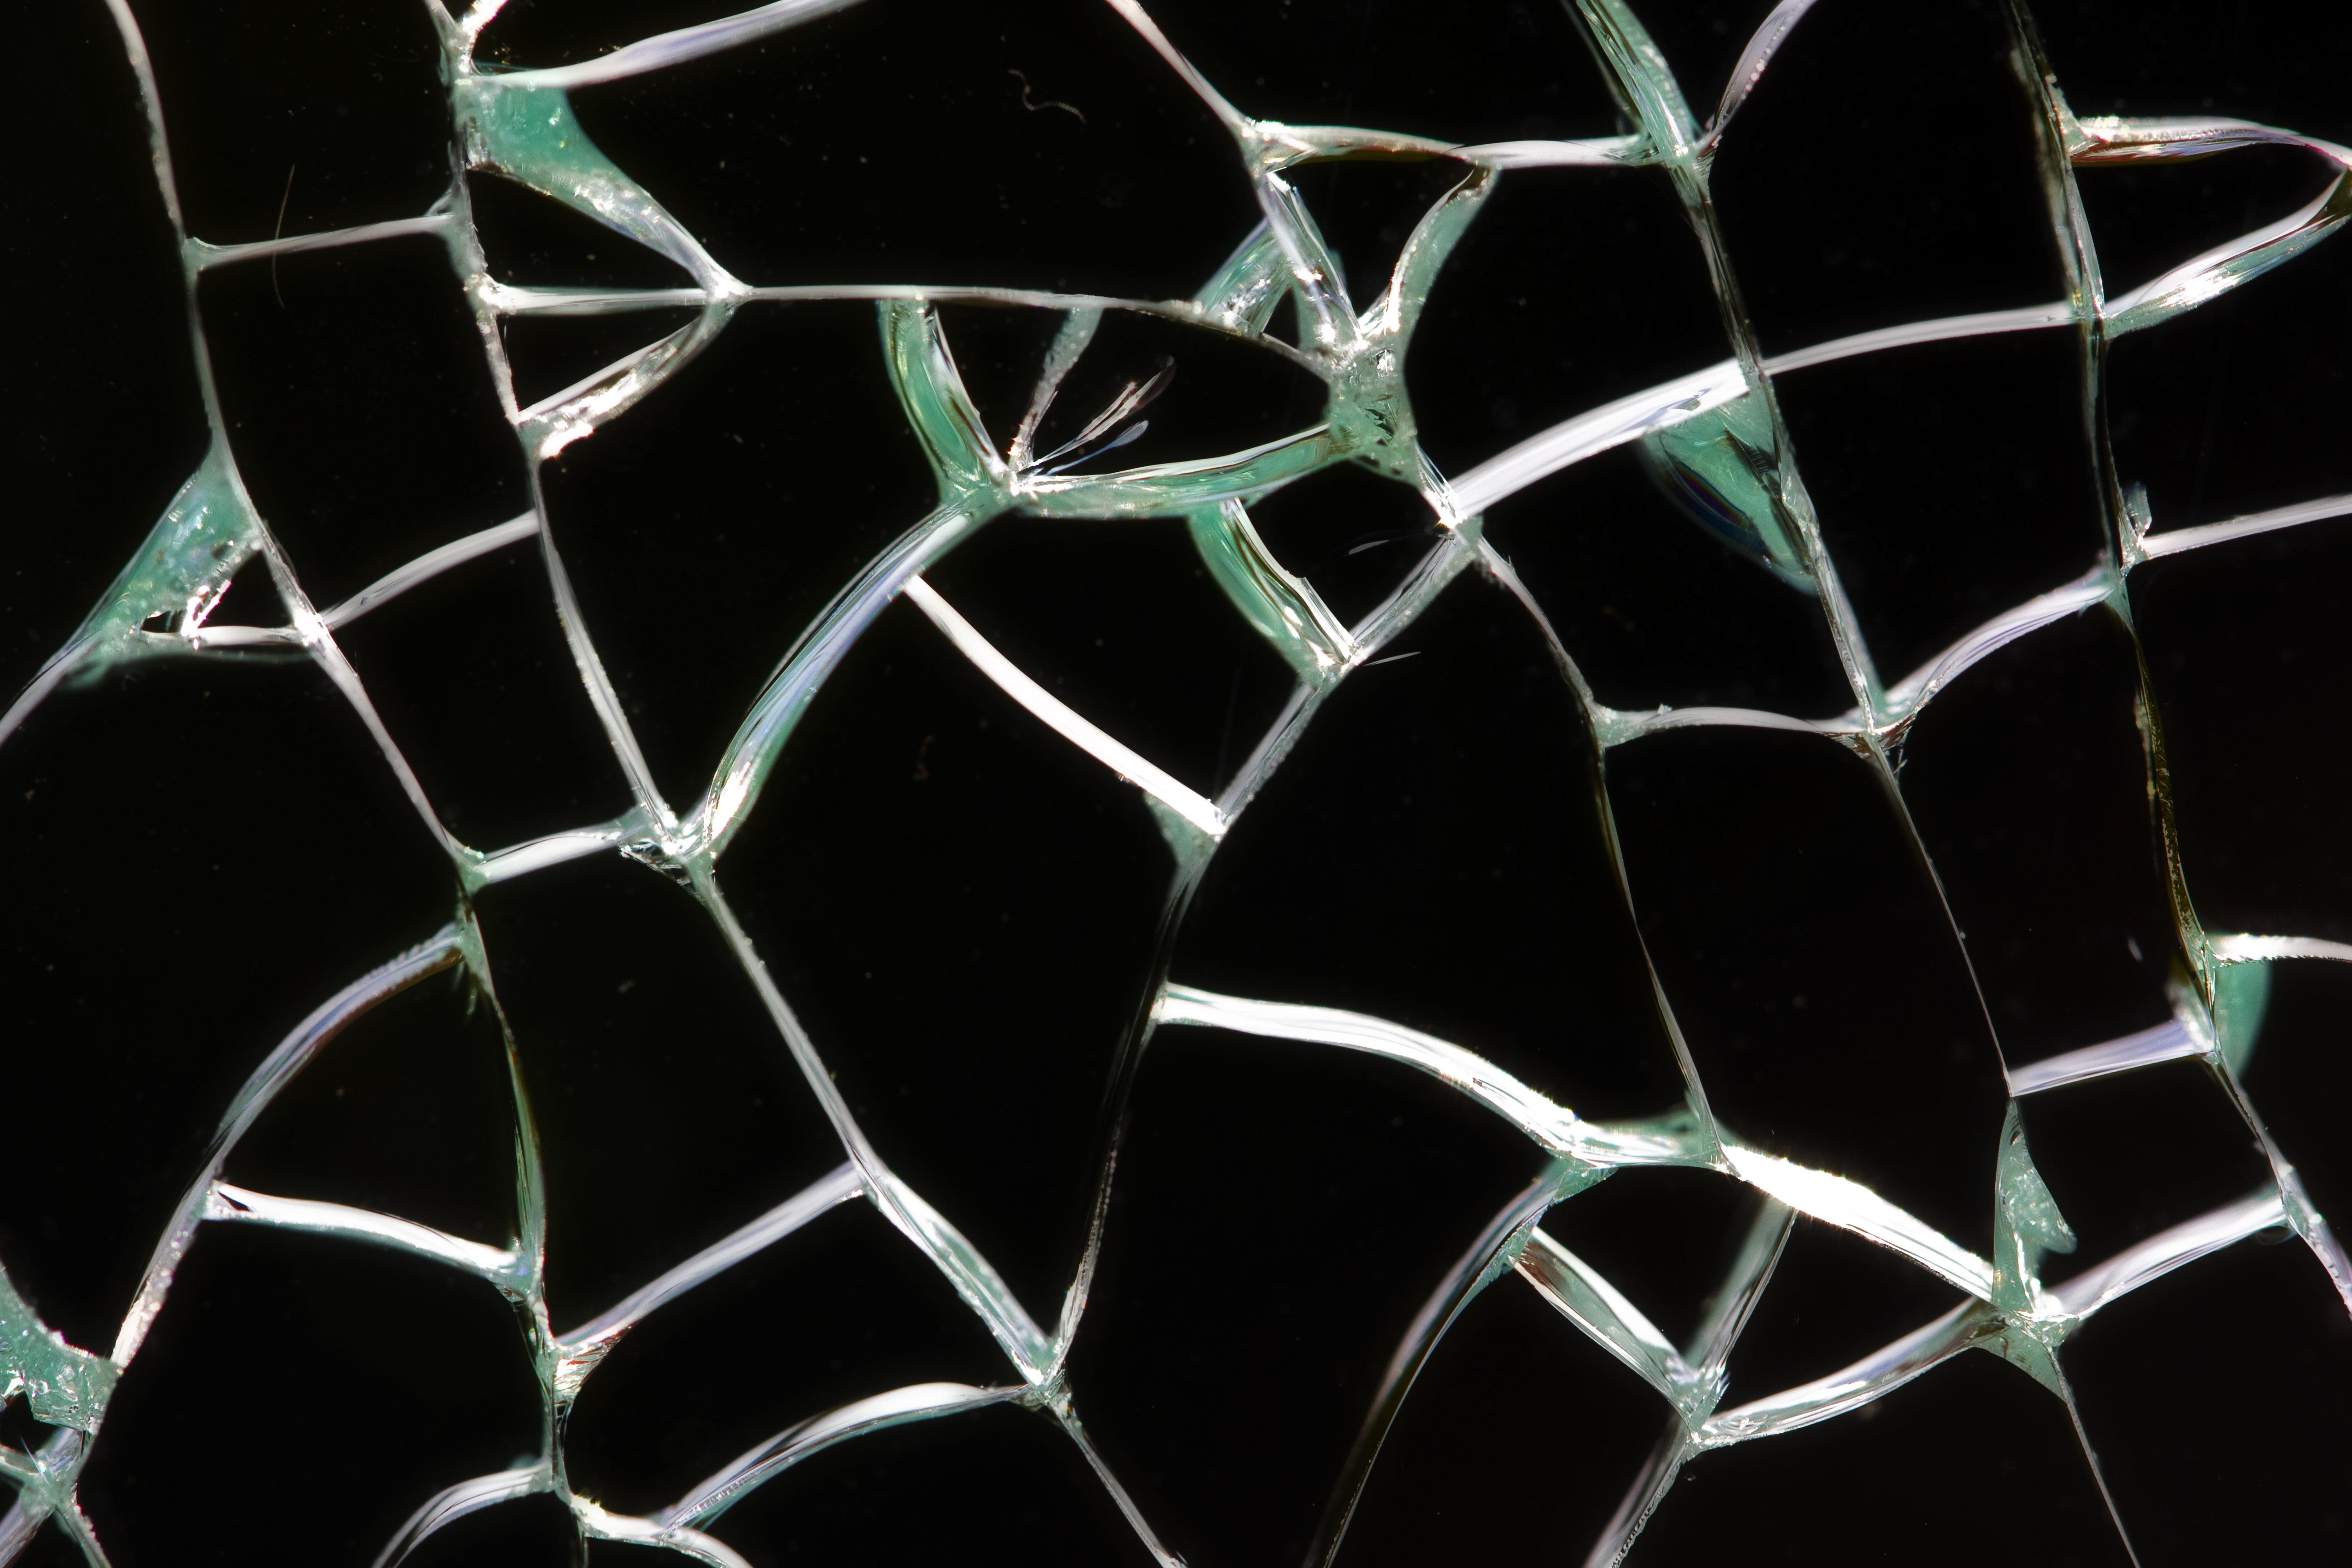 Amber 39 s little crafts broken glass for Broken glass crafts